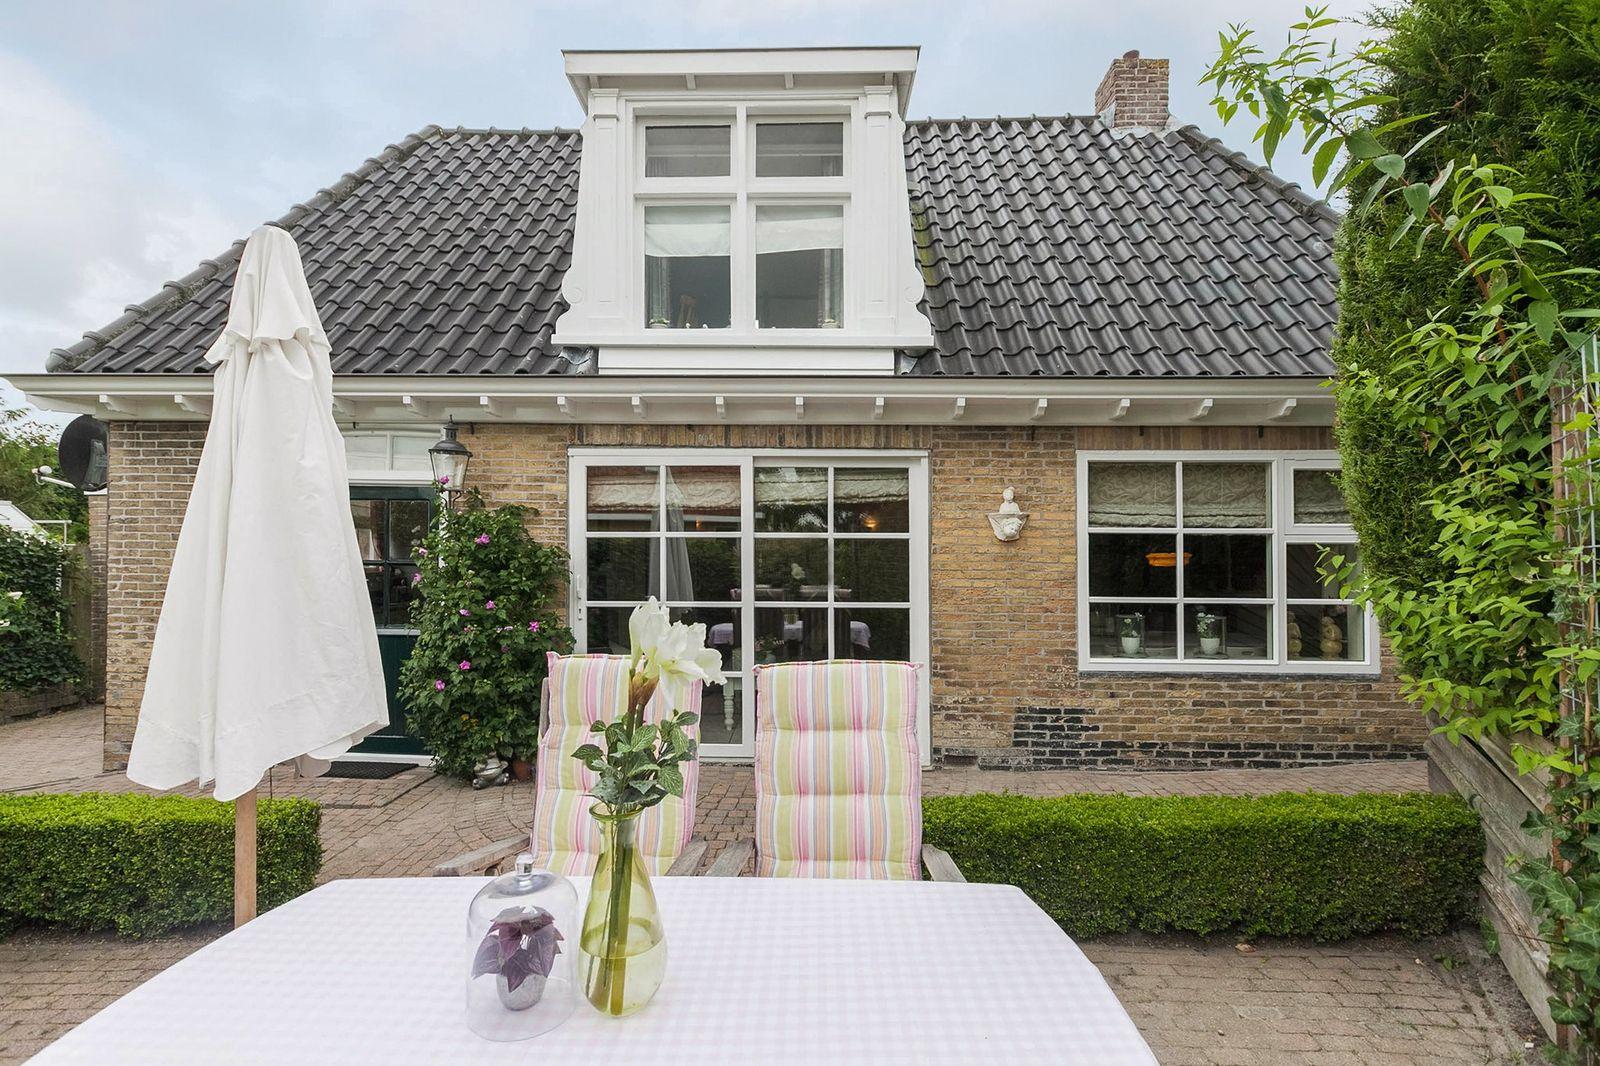 Oostend 26, Witmarsum